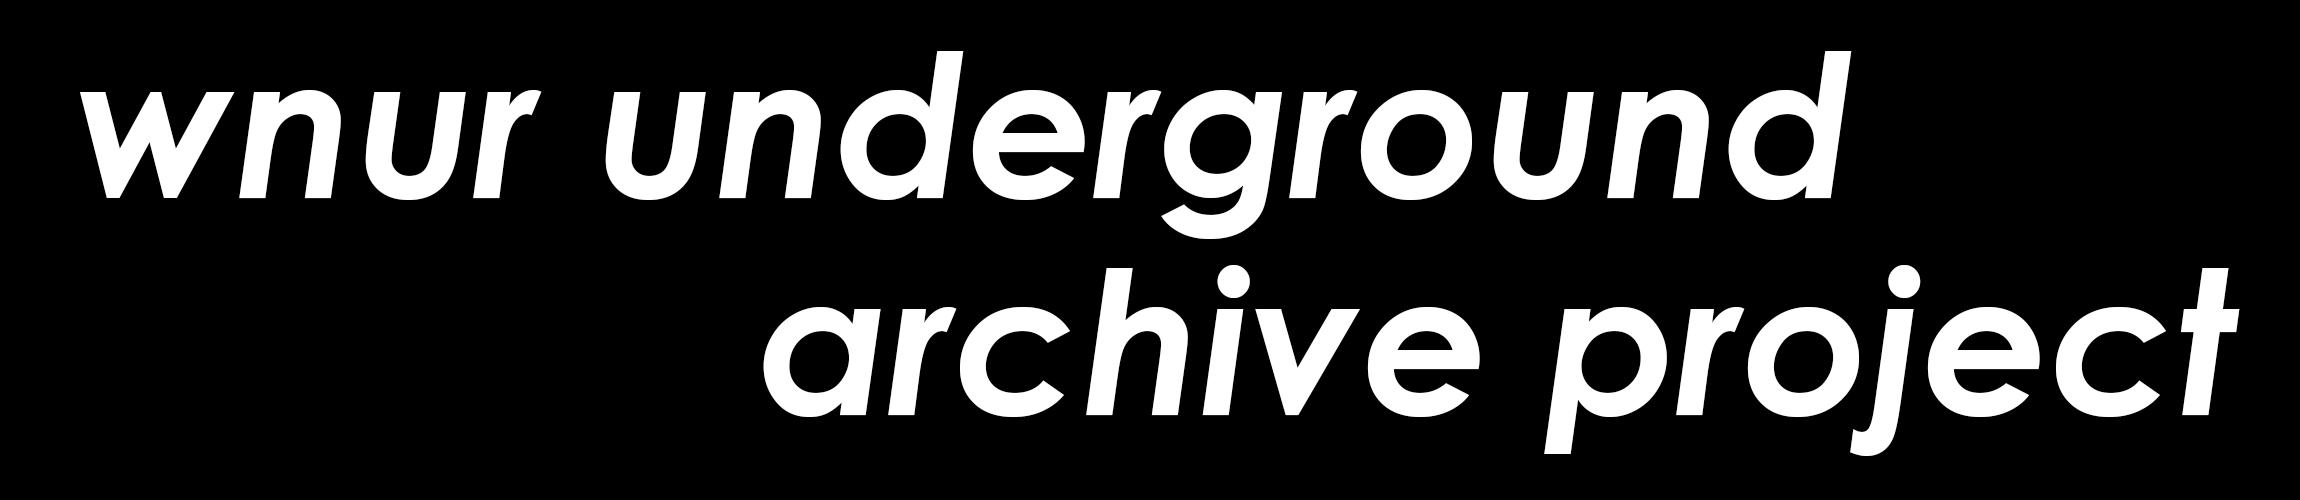 WNUR Underground Archive Project